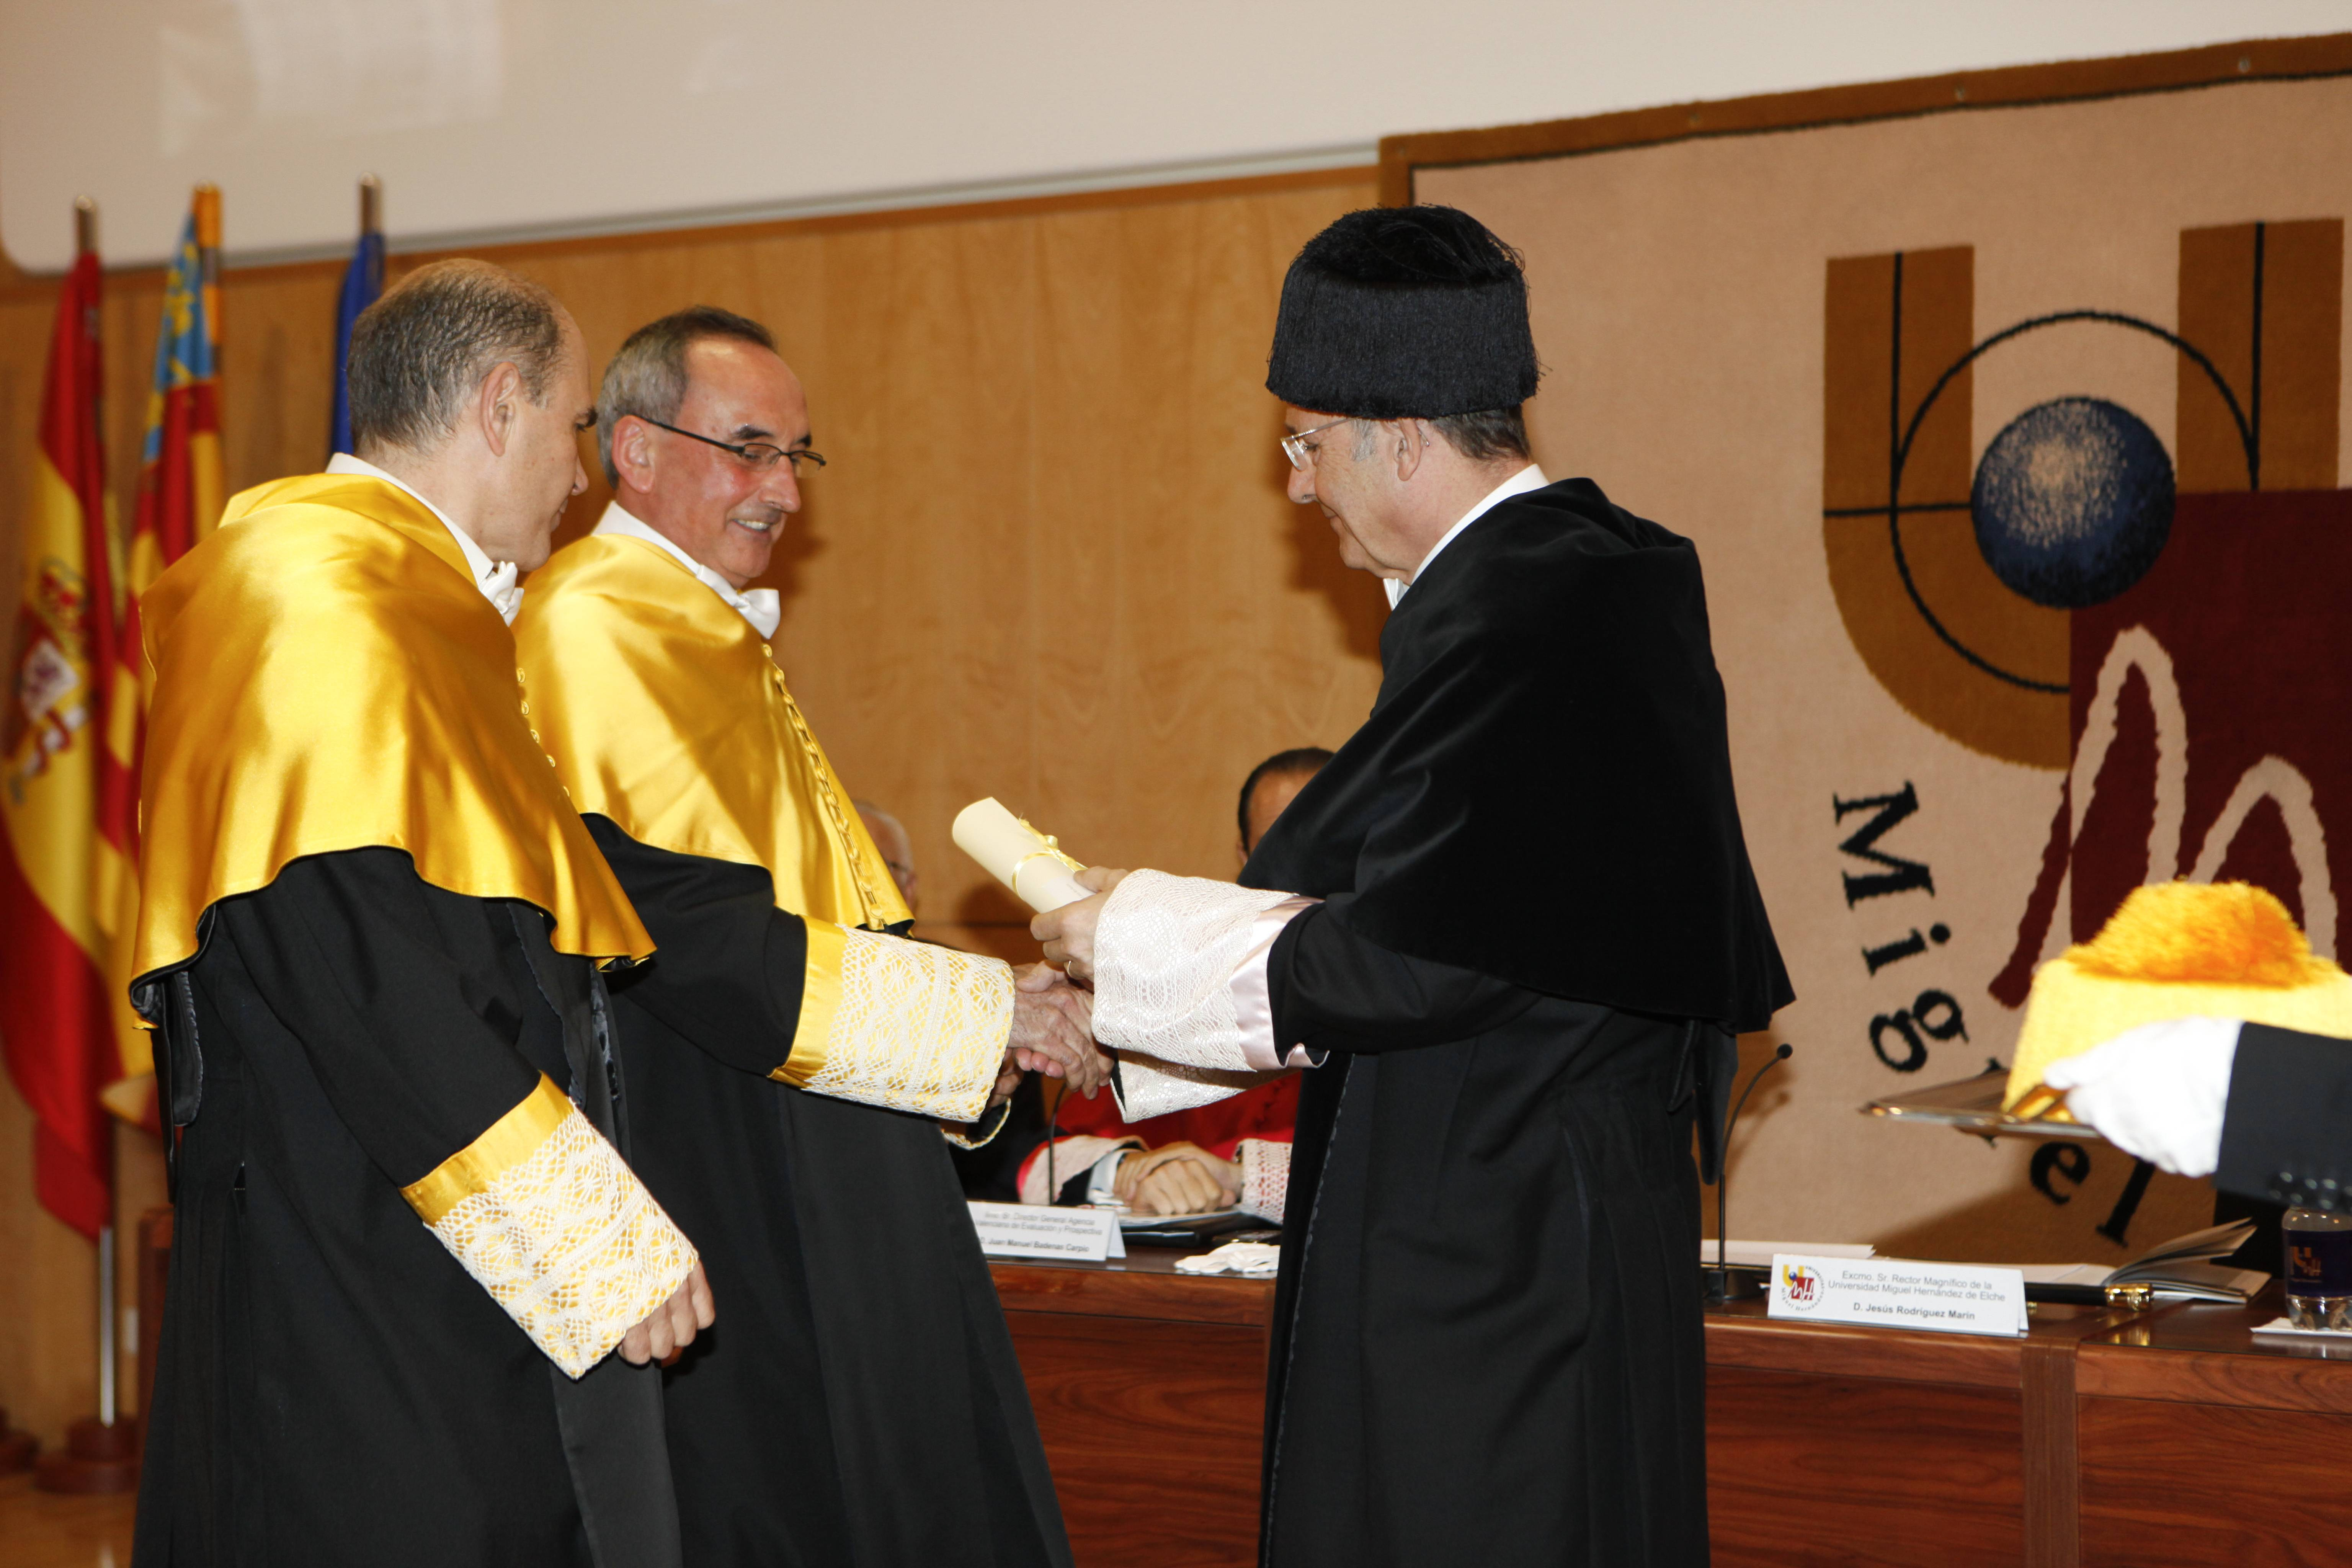 doctor-honoris-causa-luis-gamir_mg_1102.jpg